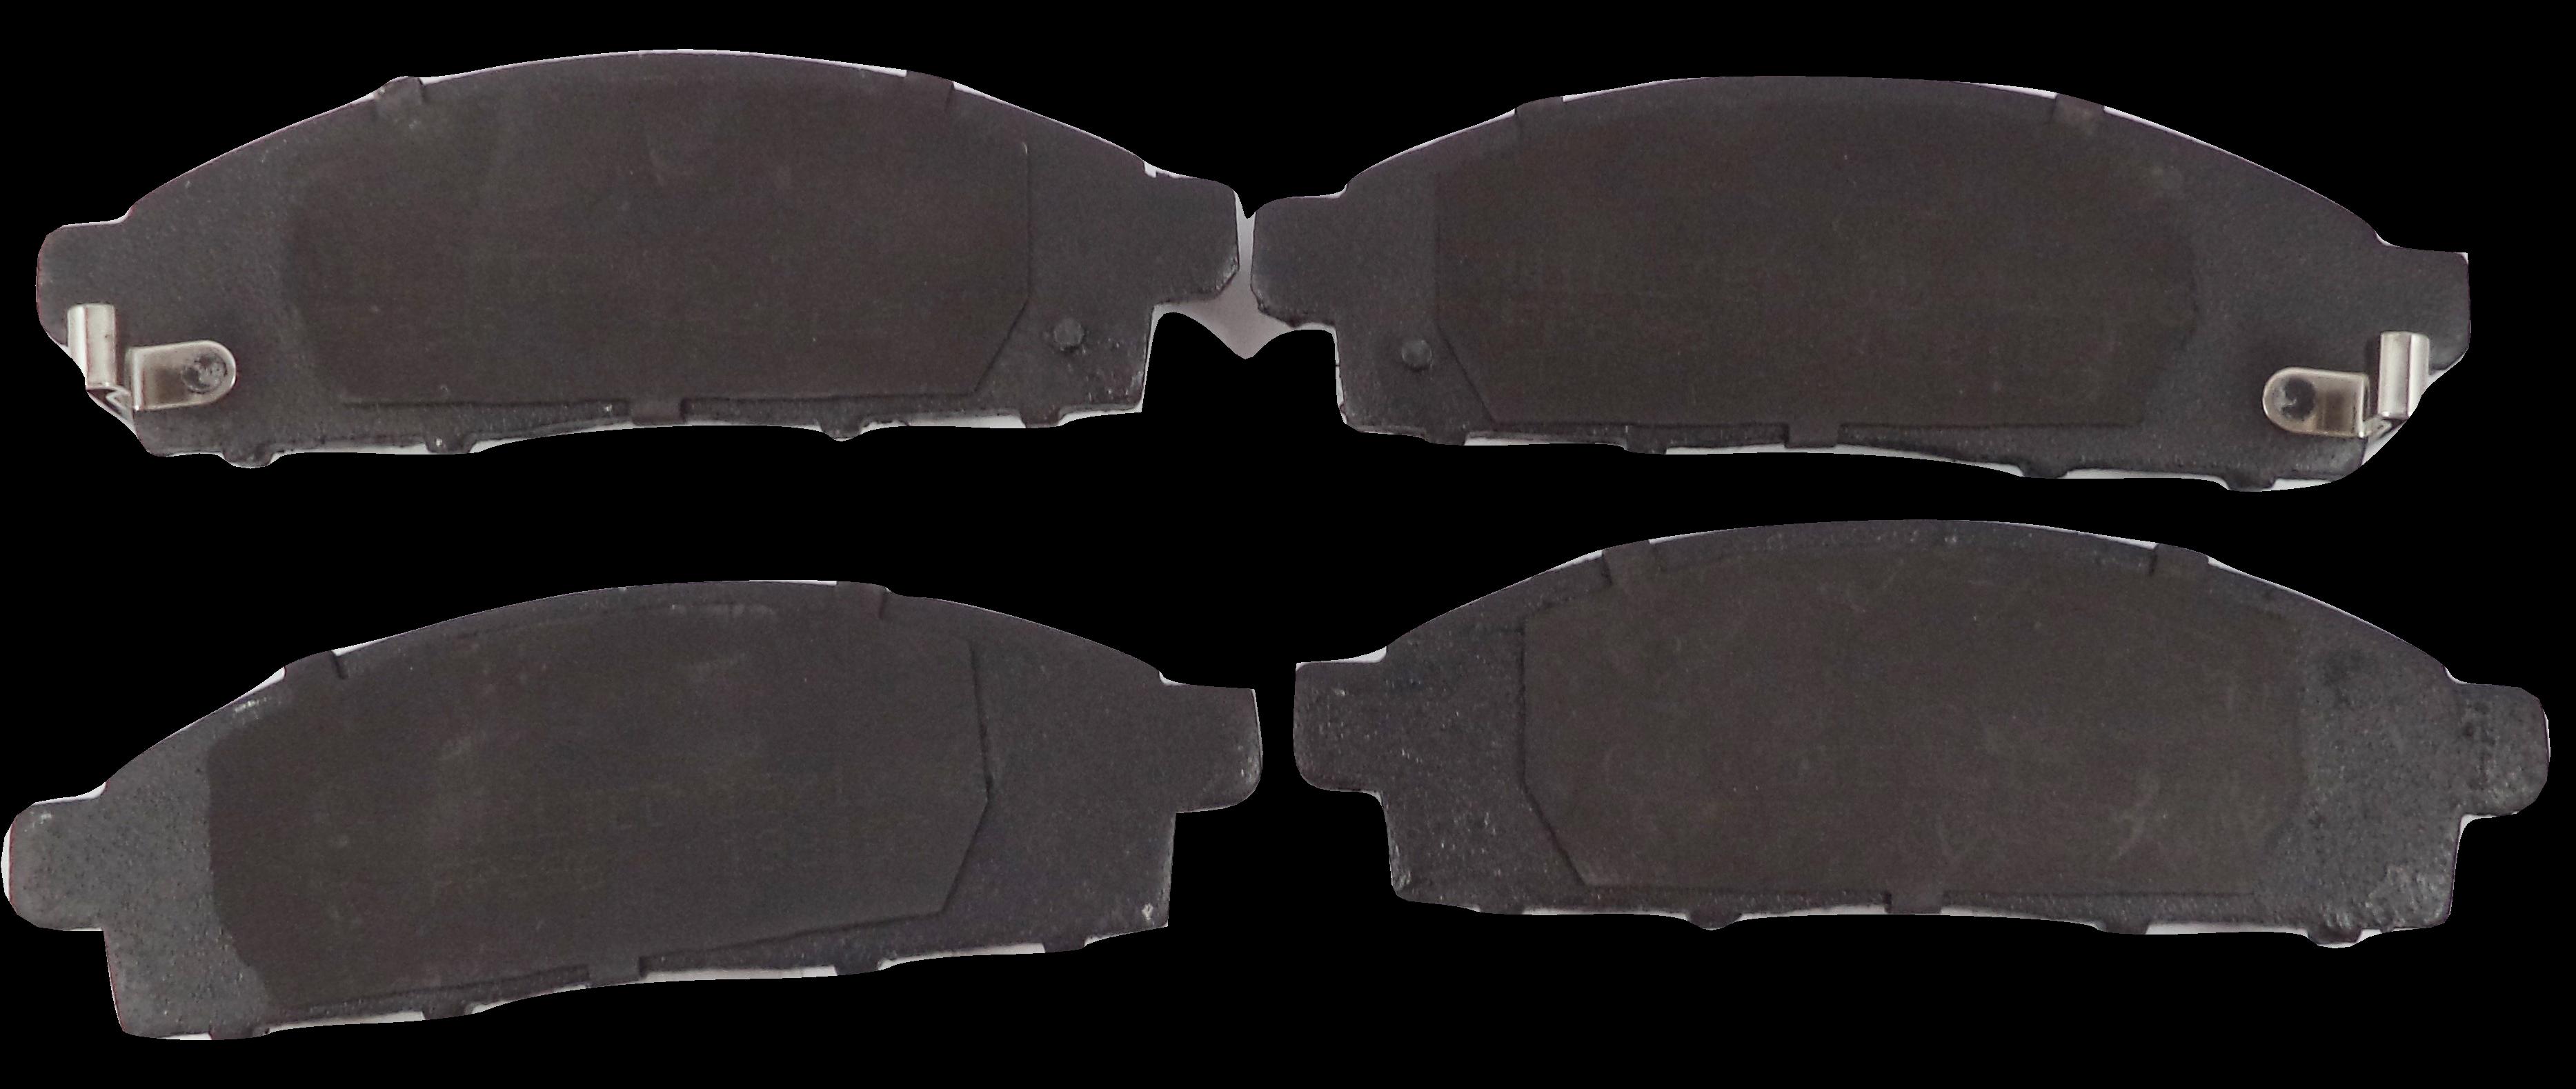 PASTILHA DE FREIO de Cerâmica FASTPAD - MITISUBISHI L200 / Pajero Dakar - Dianteira - FP696